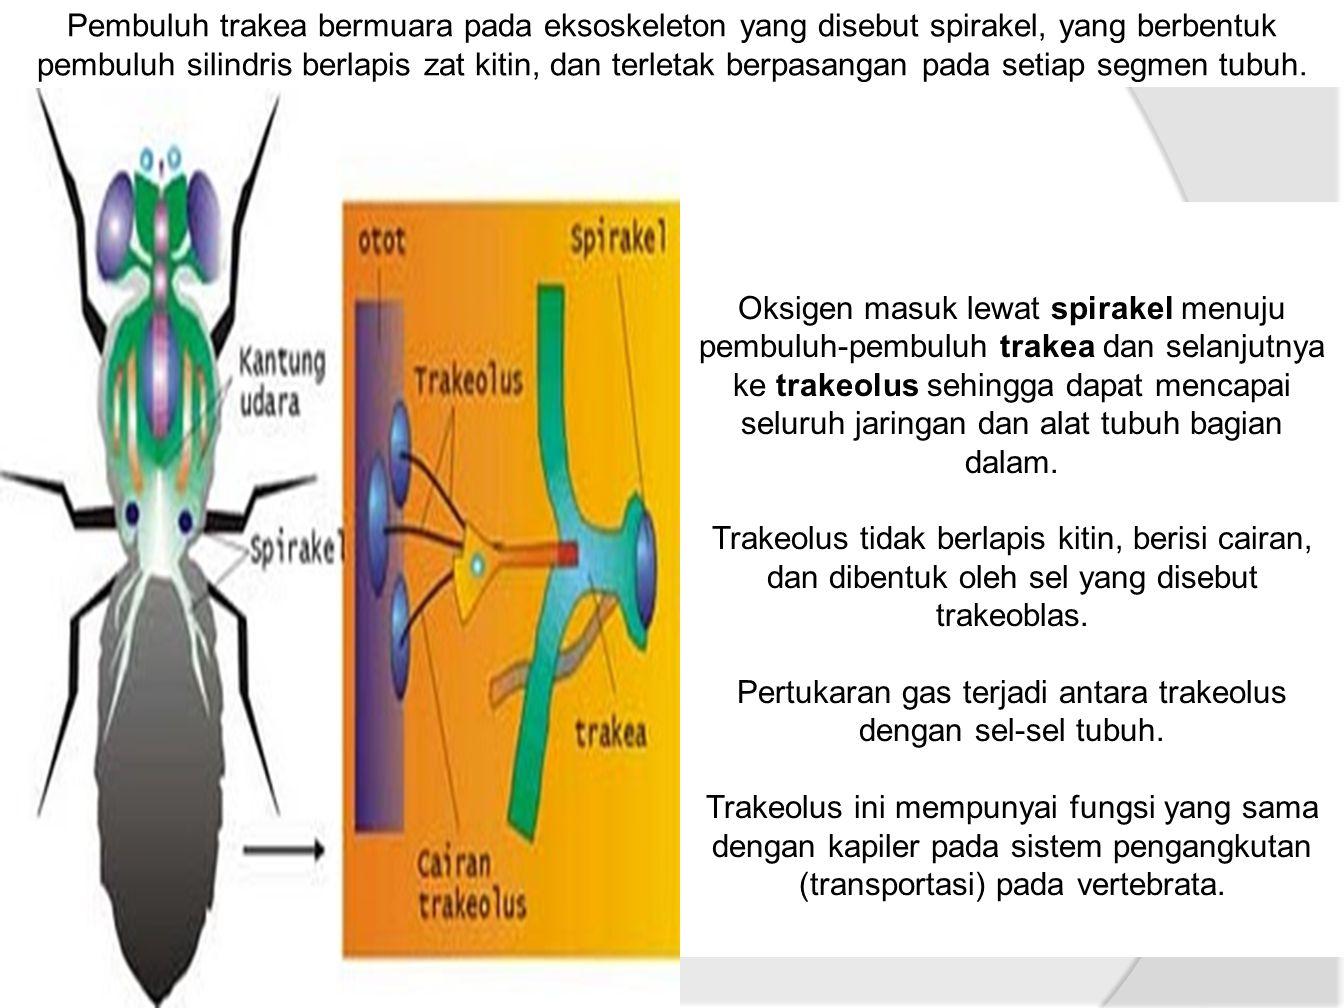 Pembuluh trakea bermuara pada eksoskeleton yang disebut spirakel, yang berbentuk pembuluh silindris berlapis zat kitin, dan terletak berpasangan pada setiap segmen tubuh.